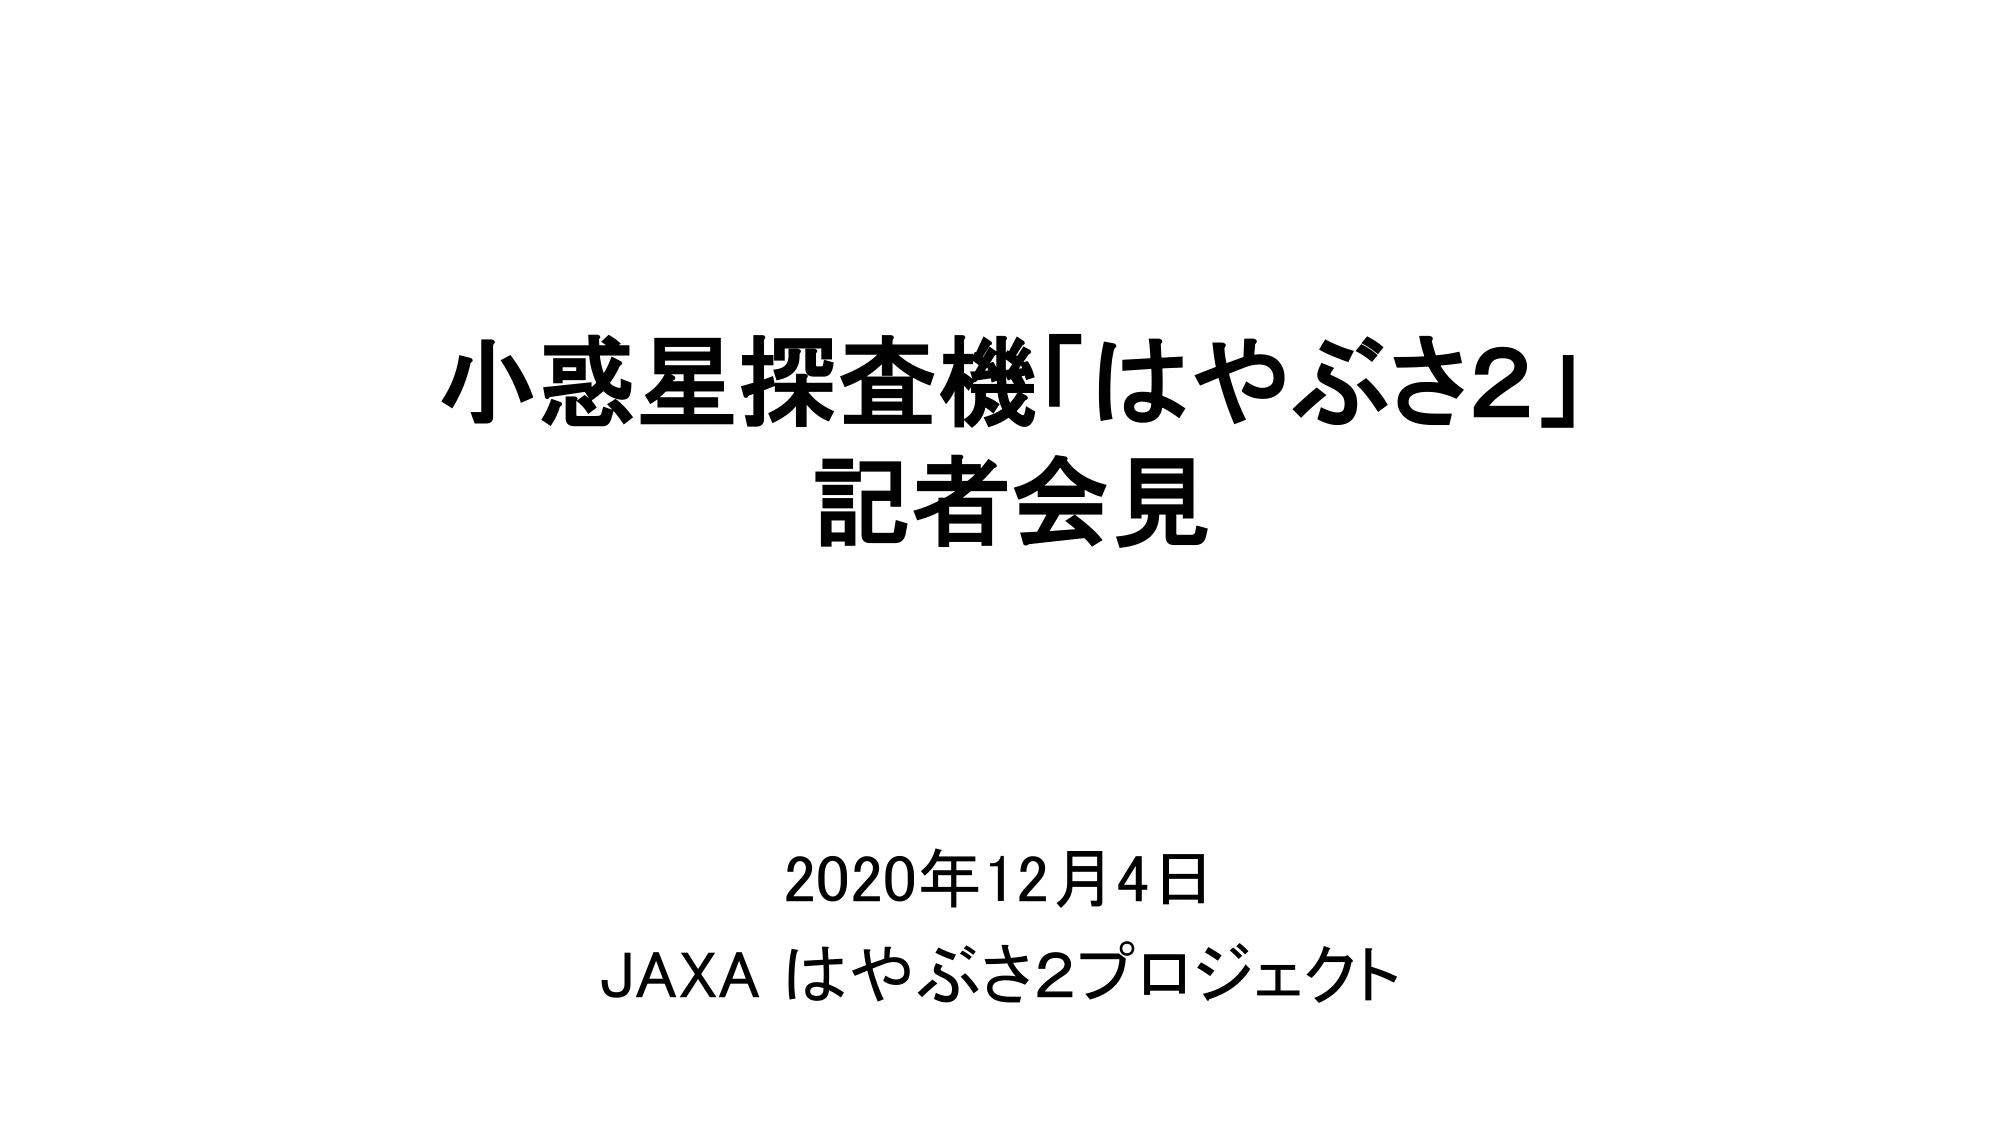 f:id:Imamura:20201204153702p:plain